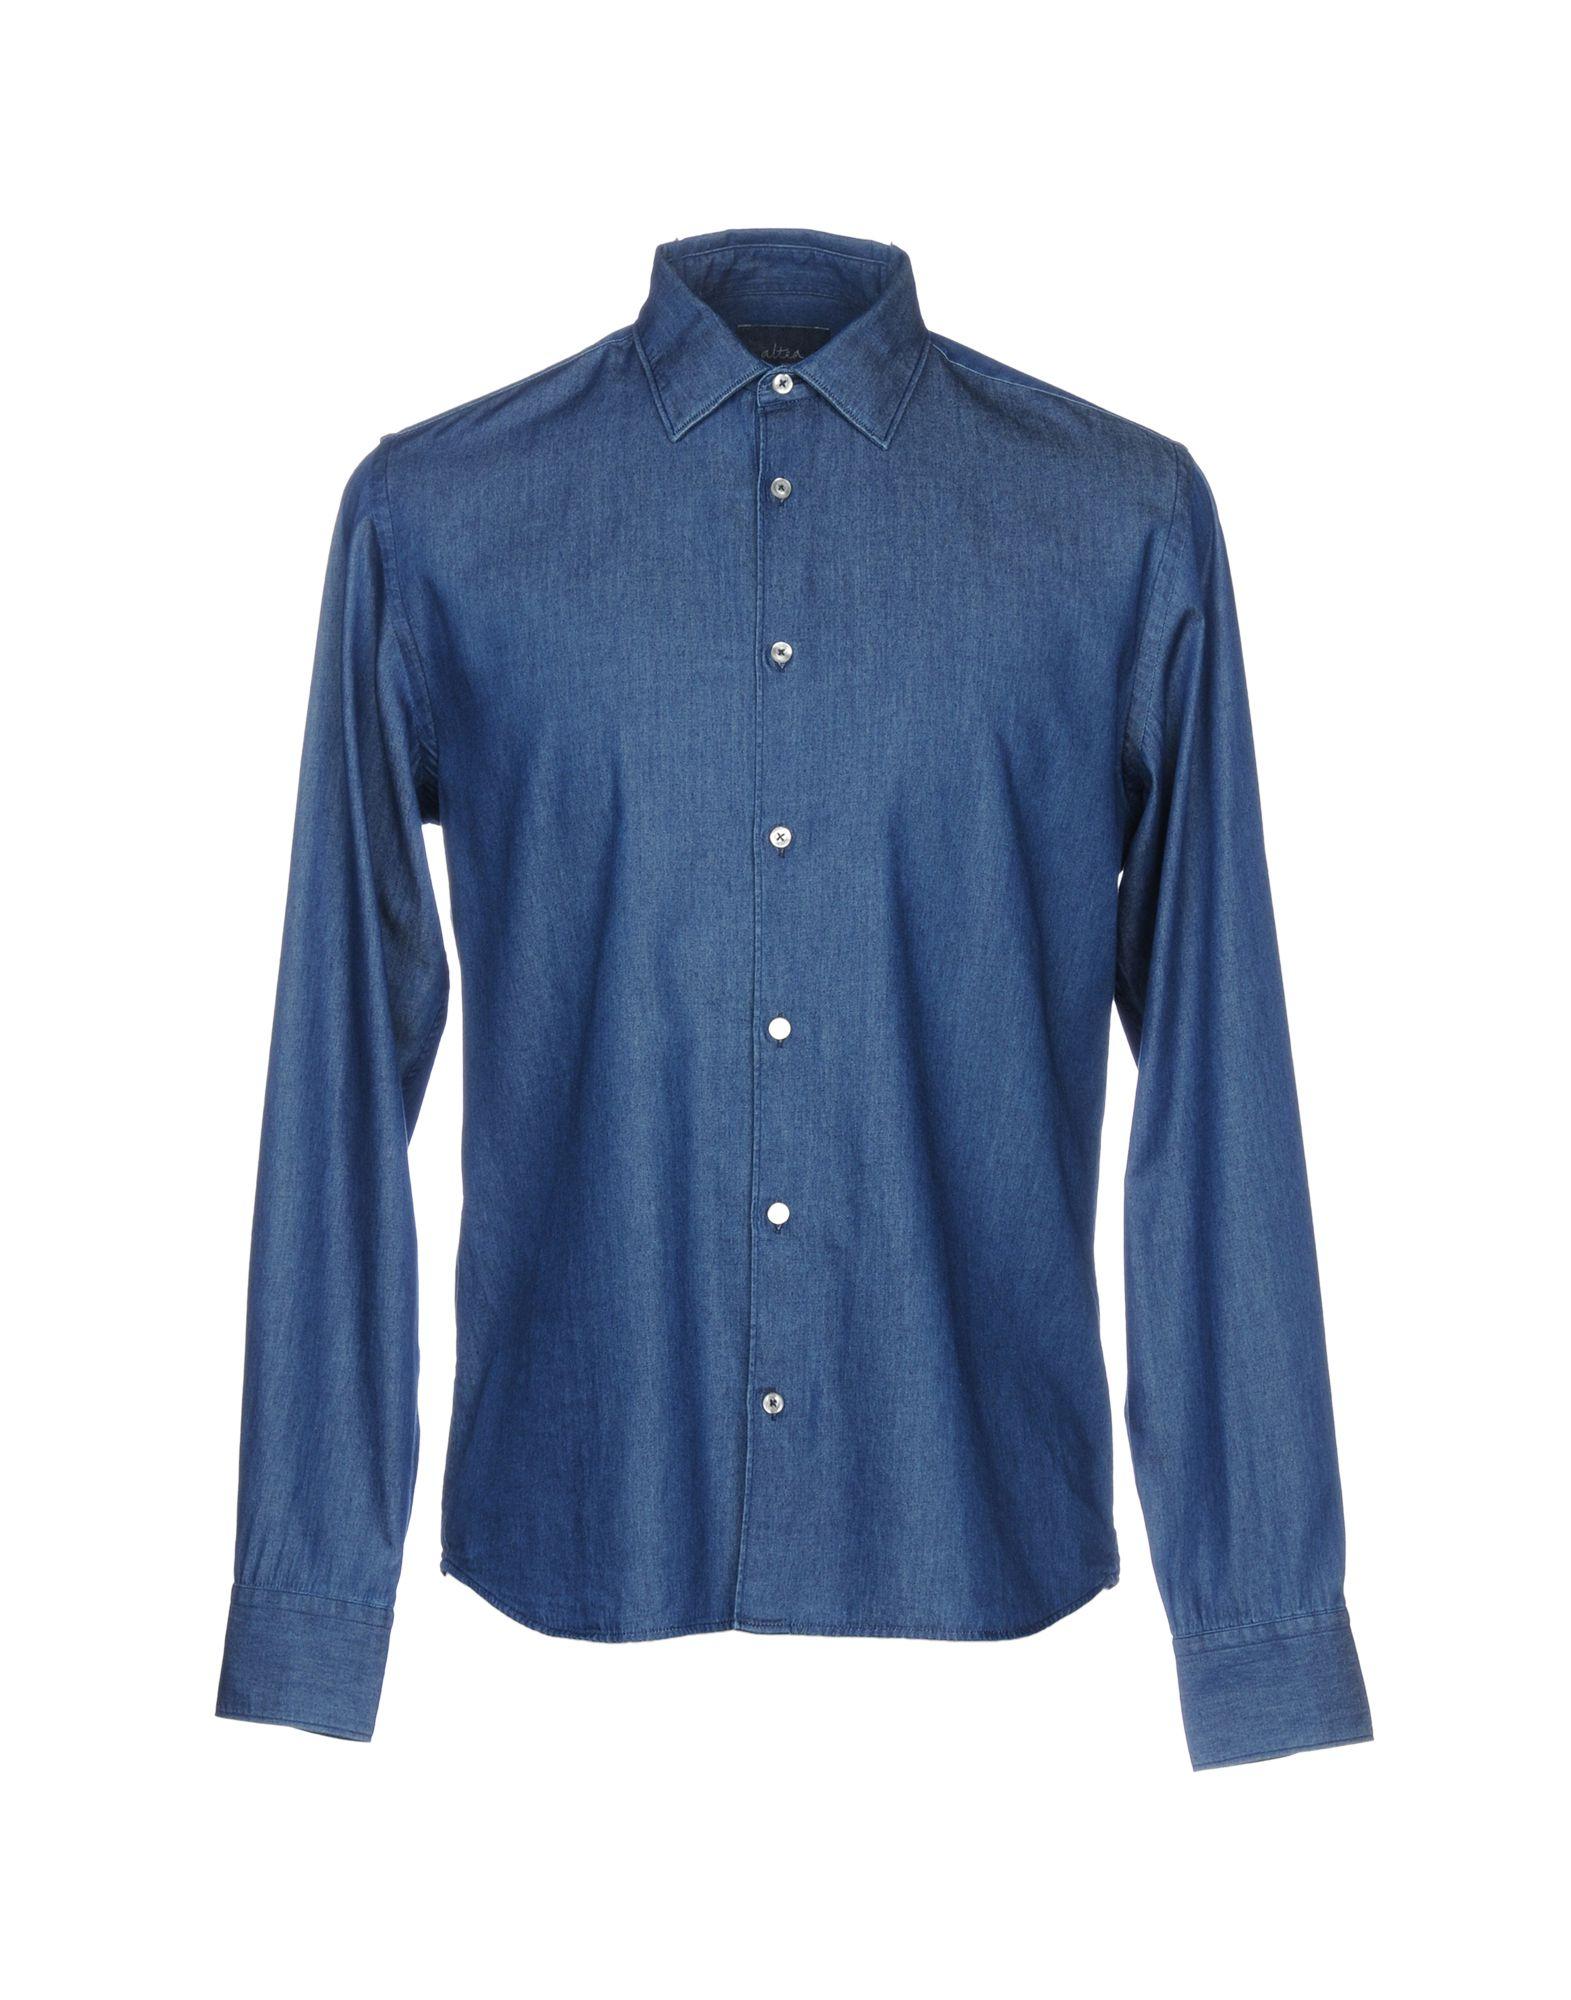 ALTEA Джинсовая рубашка